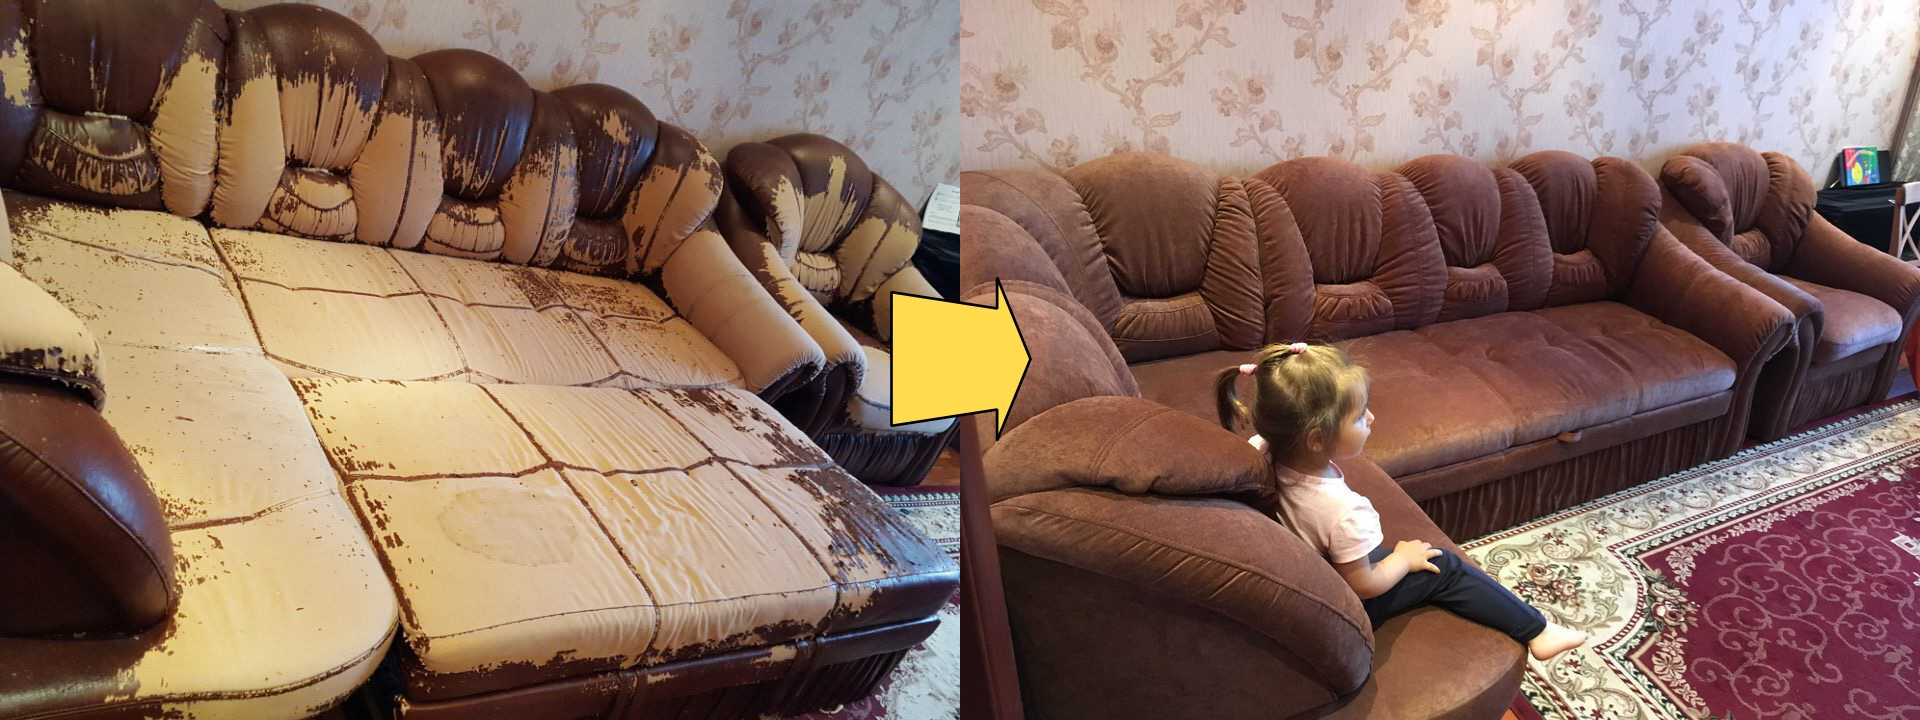 Перетяжка дивана своими руками 27